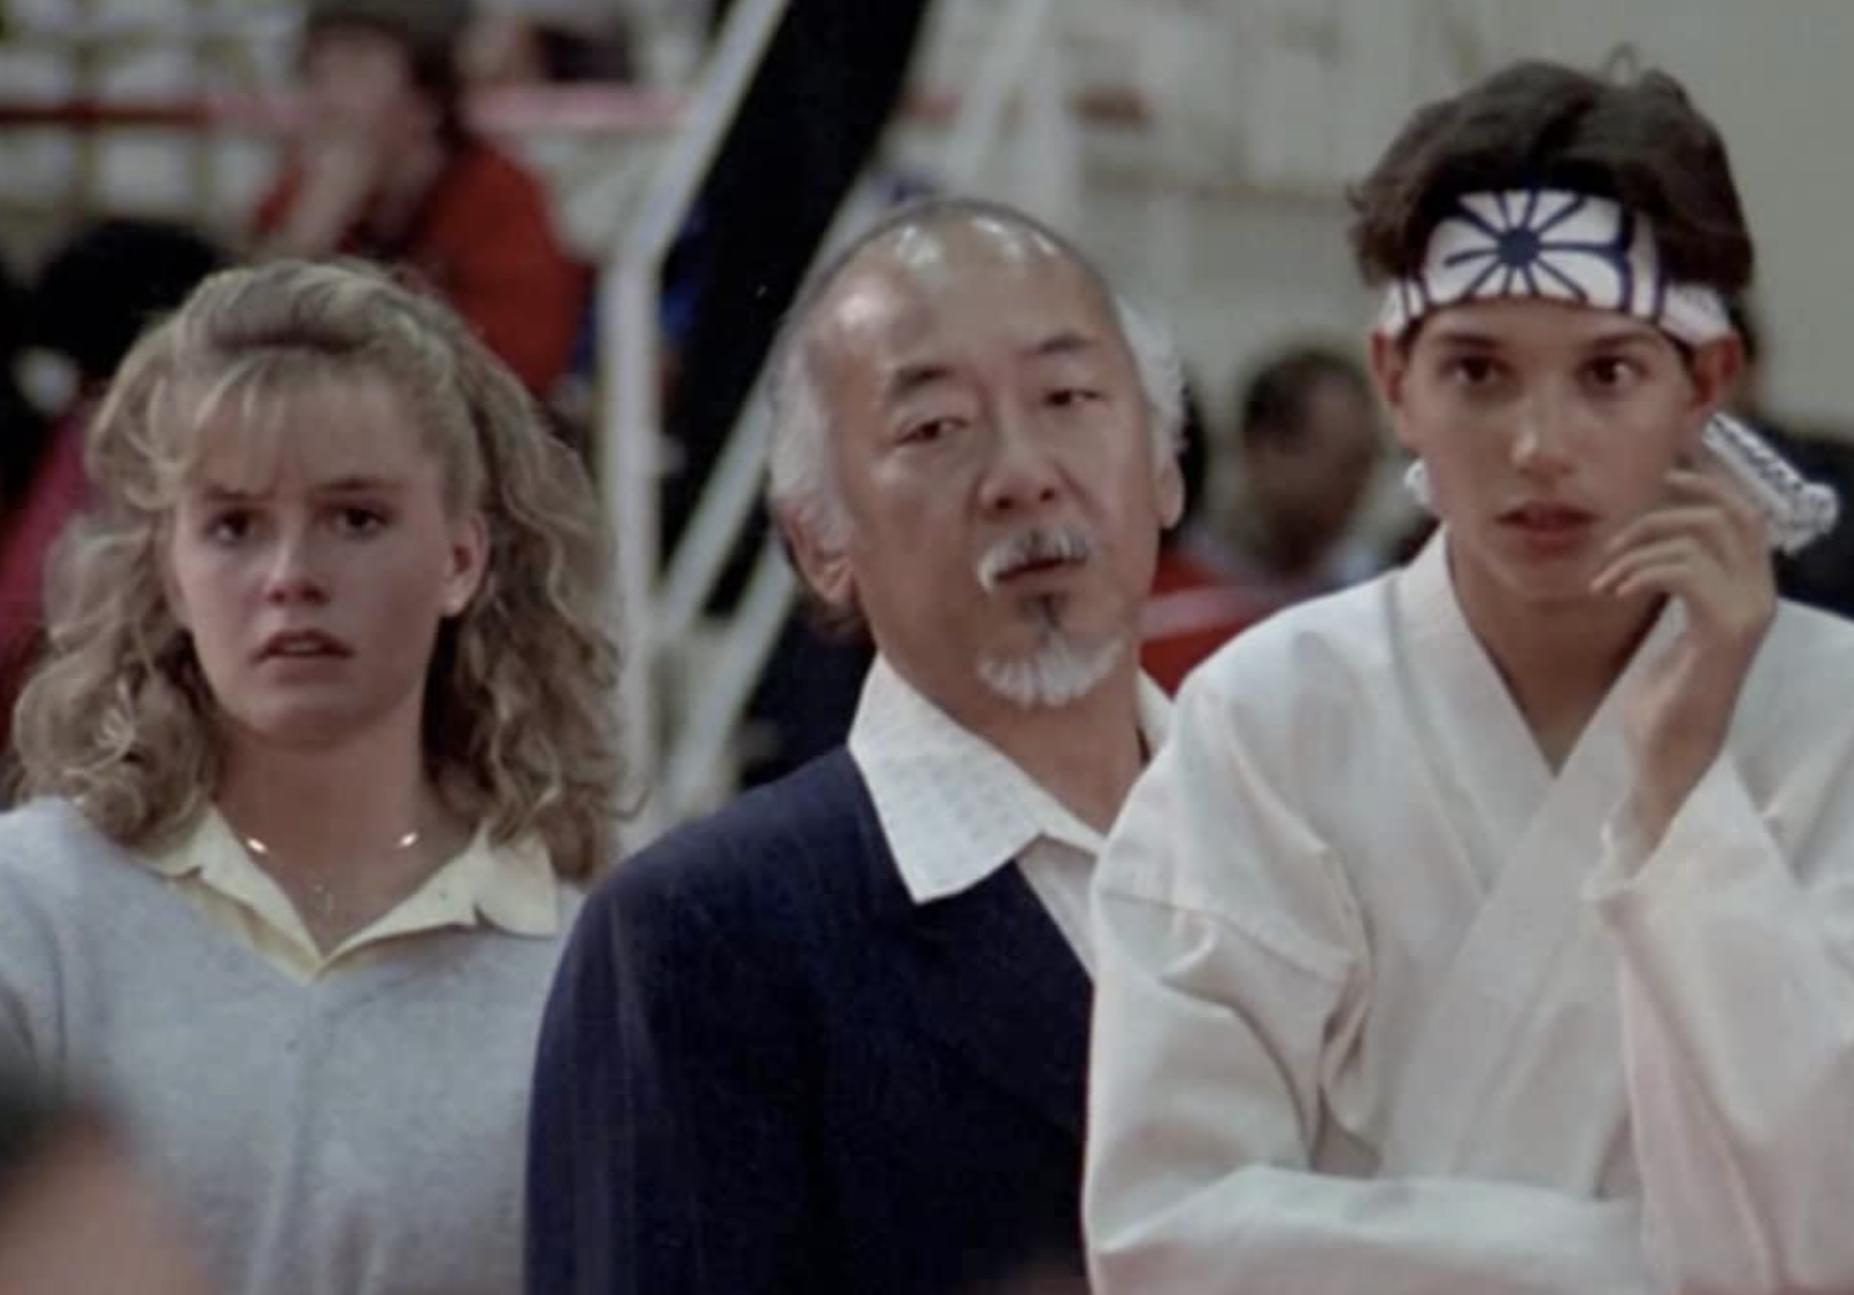 Screenshot 2021 05 05 at 14.33.36 e1620221714781 Cobra Kai Proves Daniel Was The Real Villain Of Karate Kid All Along